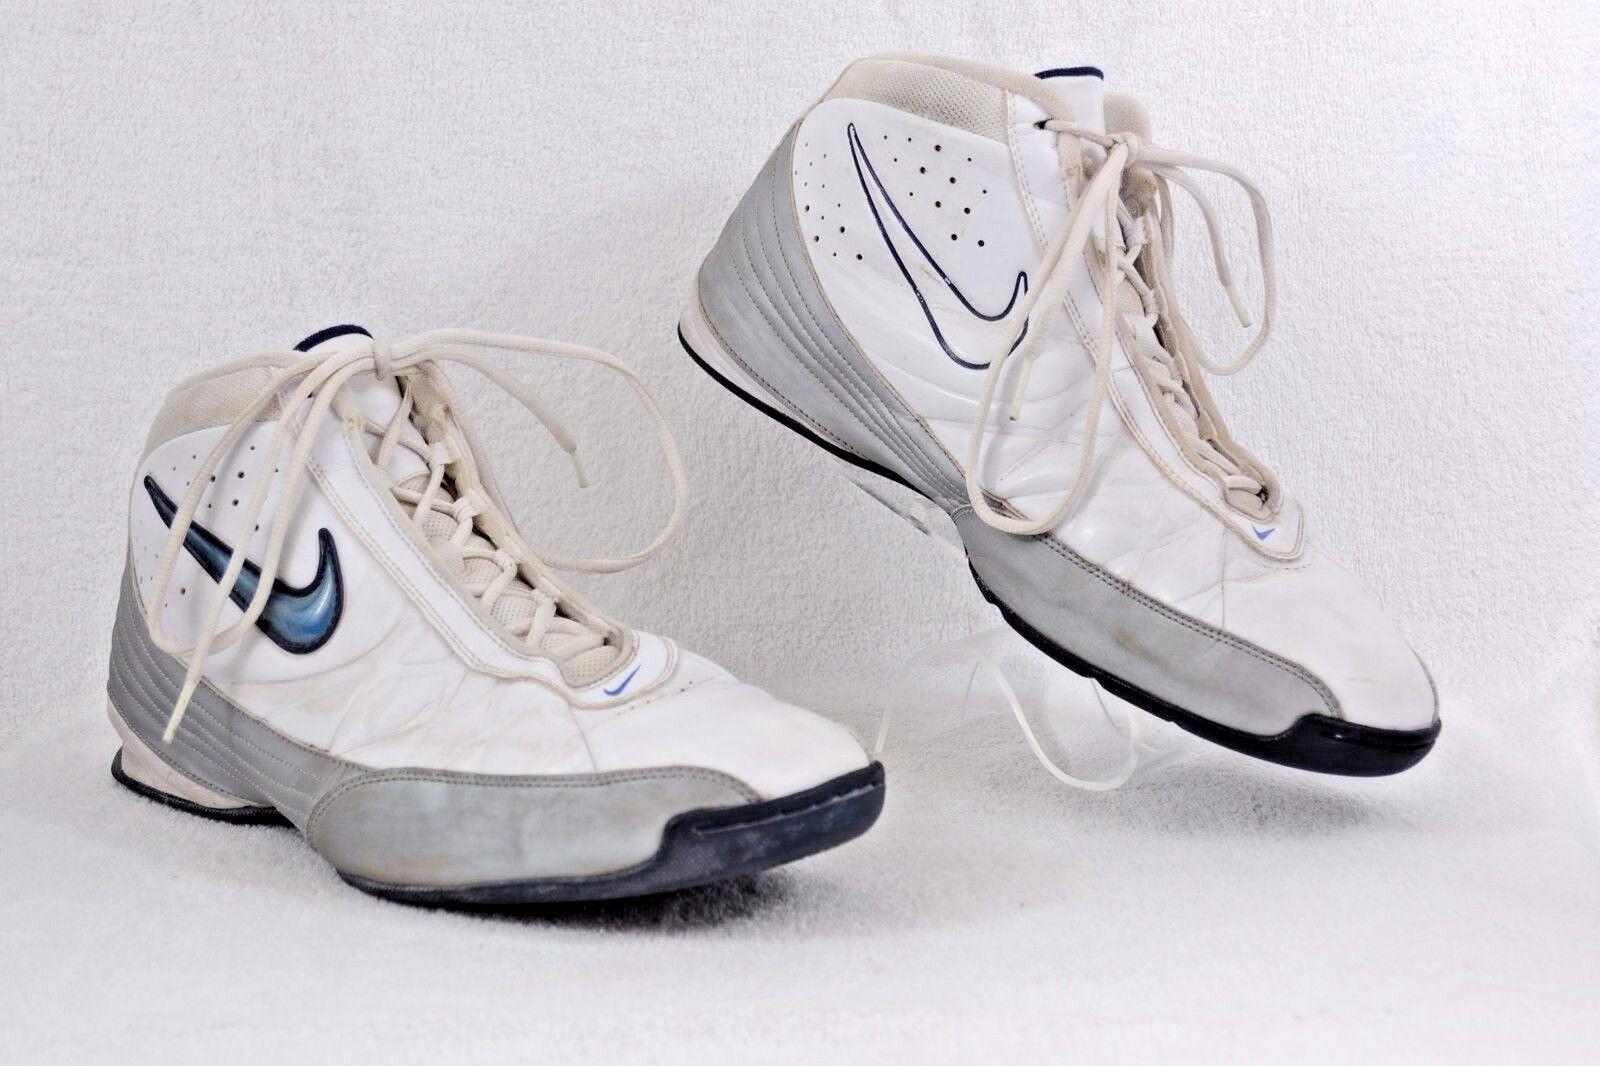 Nike Vintage AIR AMP BB 324798-141 White & Silver Mens 13M EUC G4